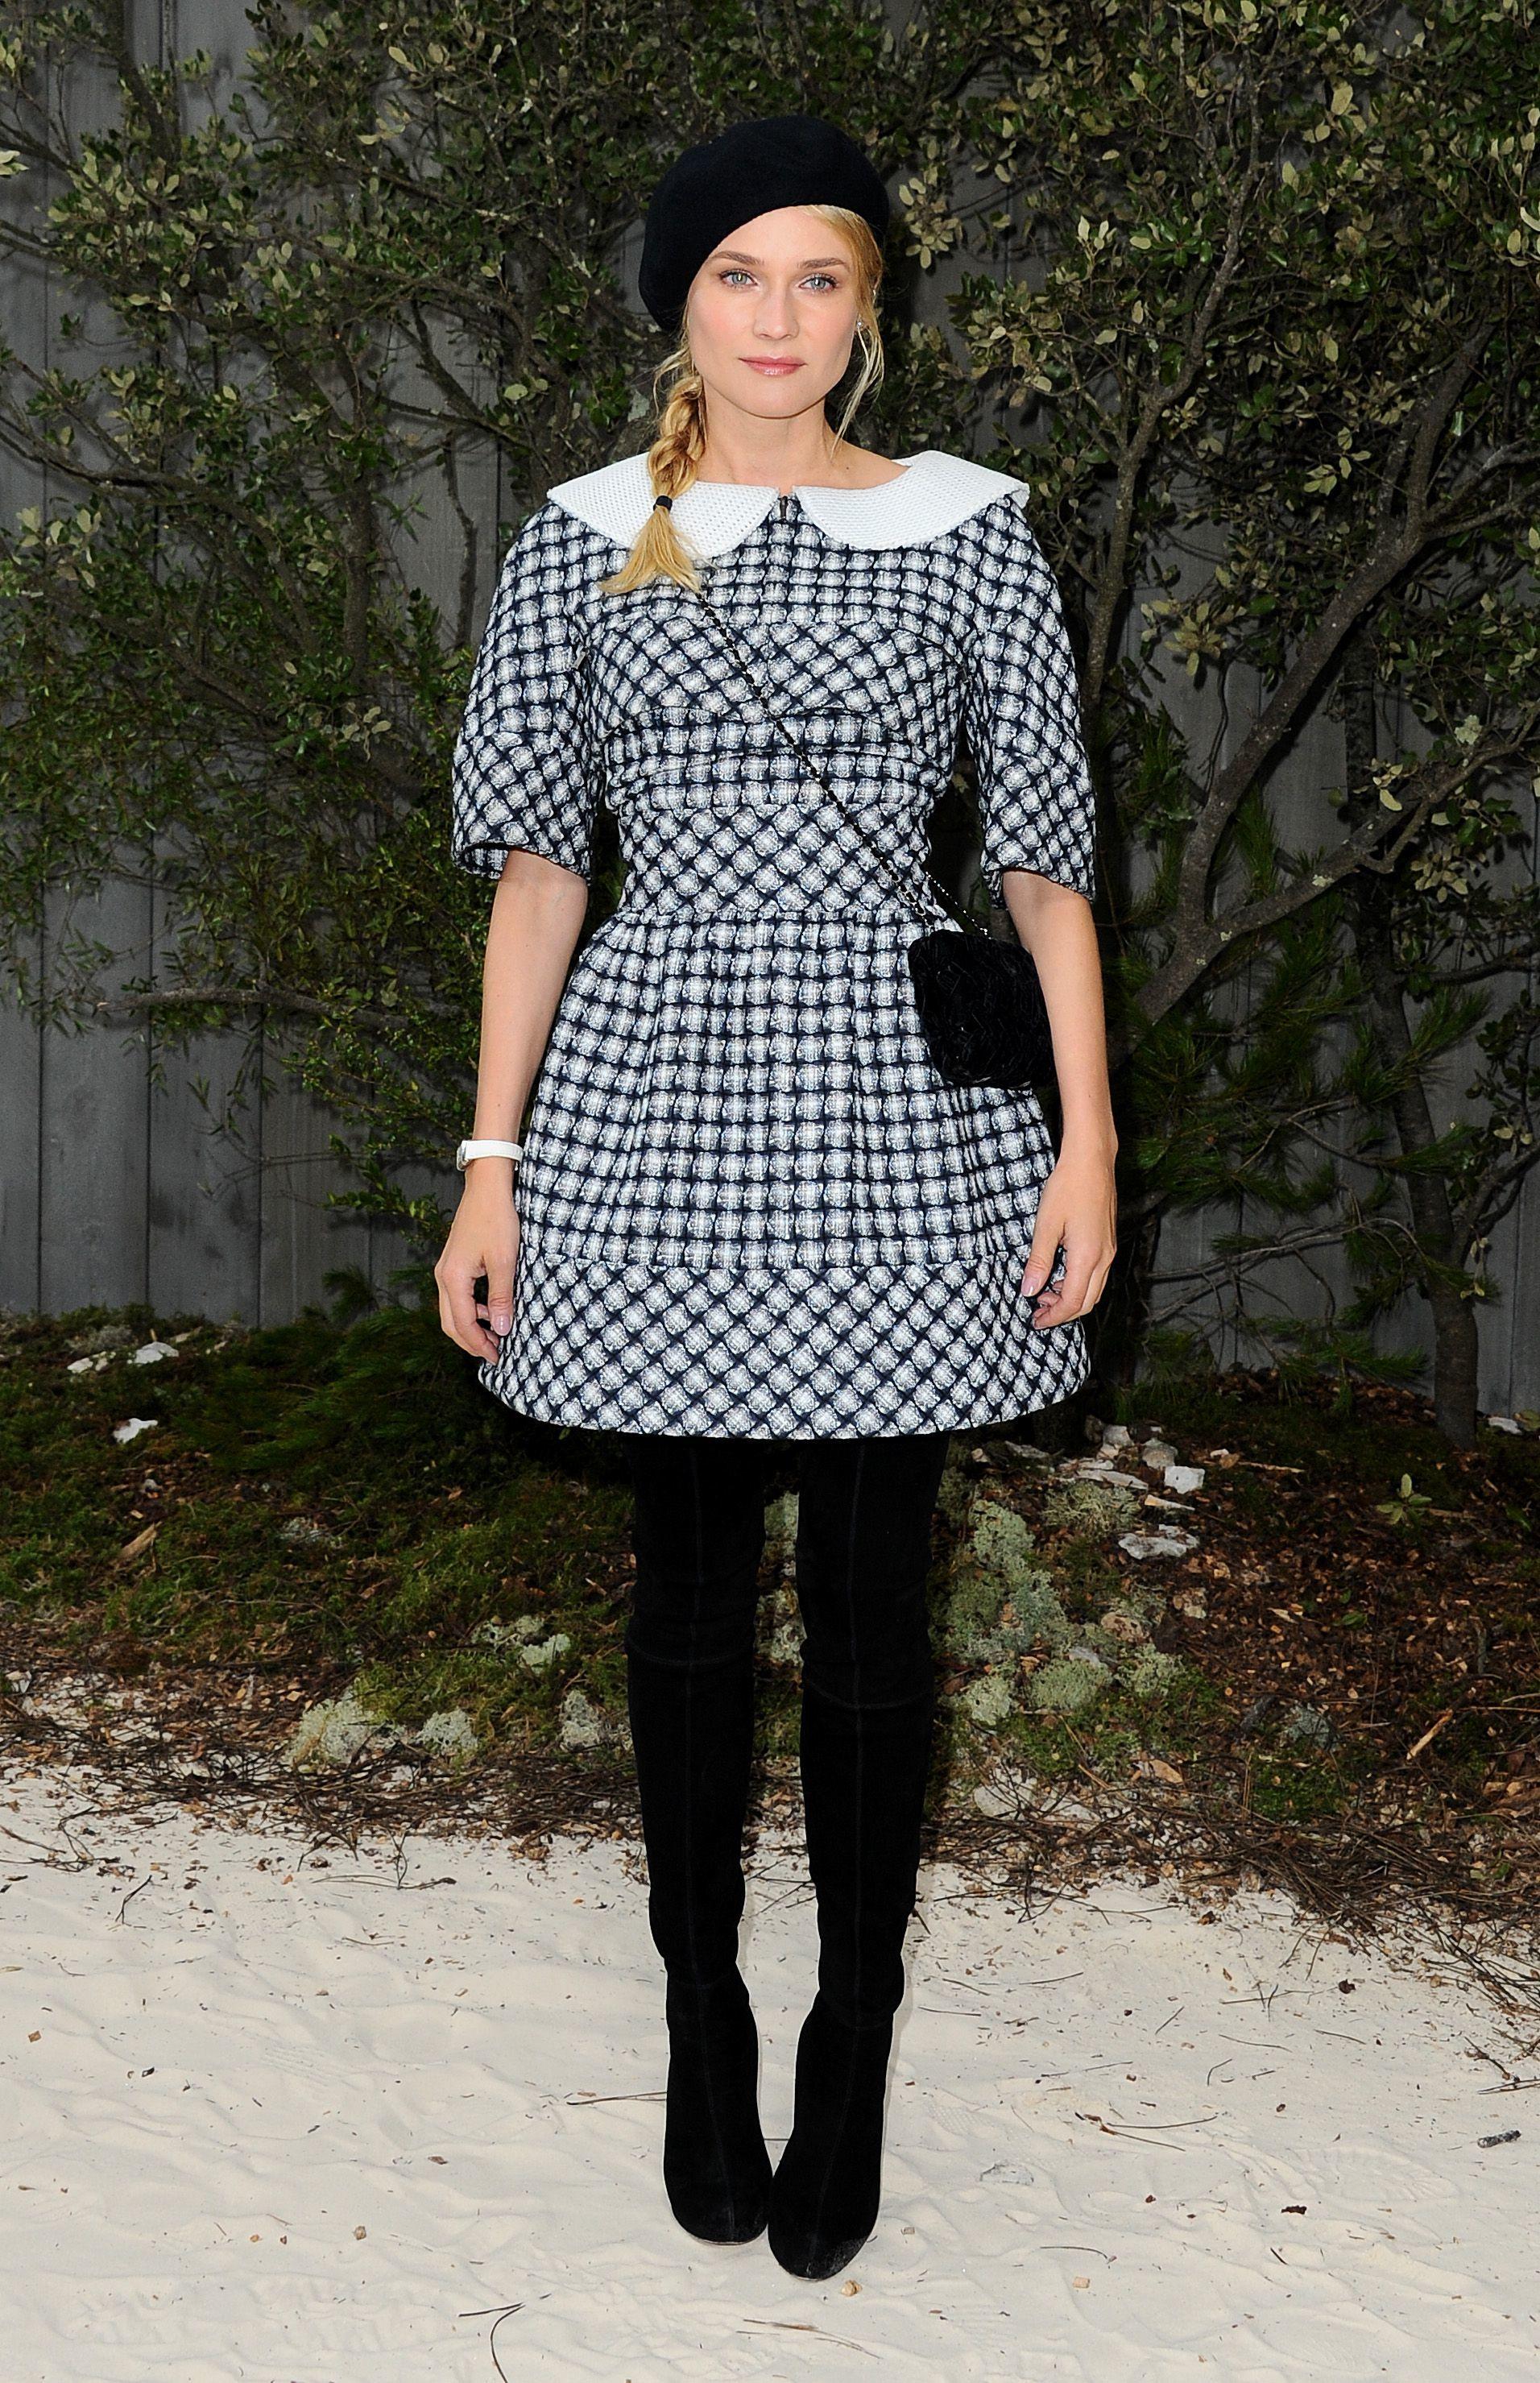 Diane Kruger Chanel black and white dress